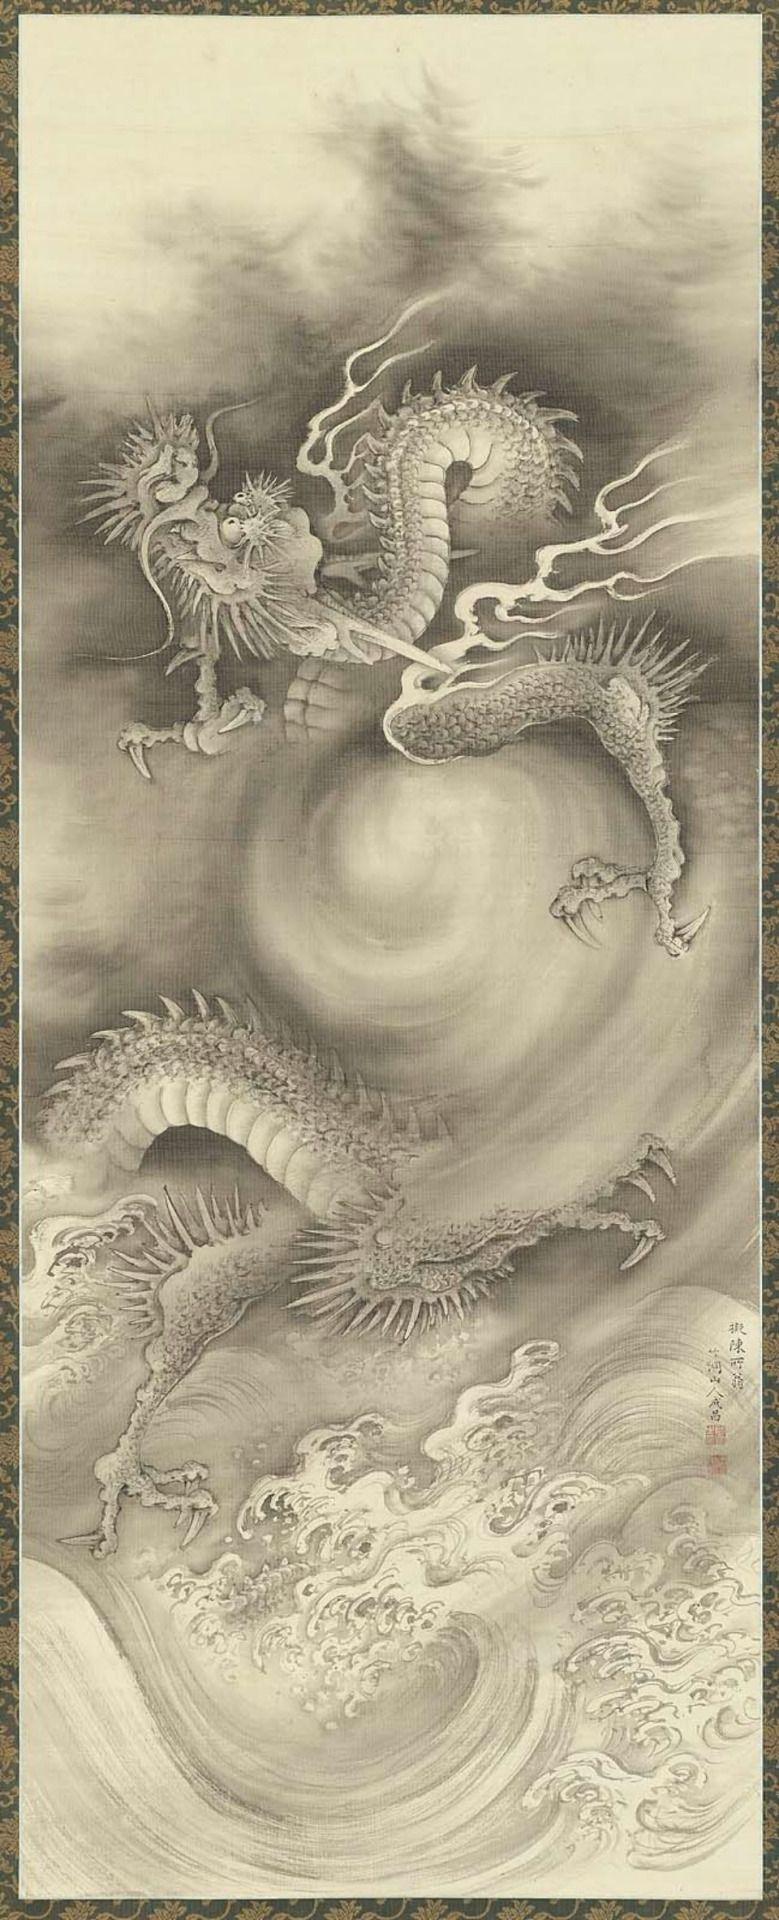 NAKABAYASHI Chikutō(中林 竹洞 Japanese, 1776-1853) Dragons 1 雲龍図 Hanging scroll; ink on silk